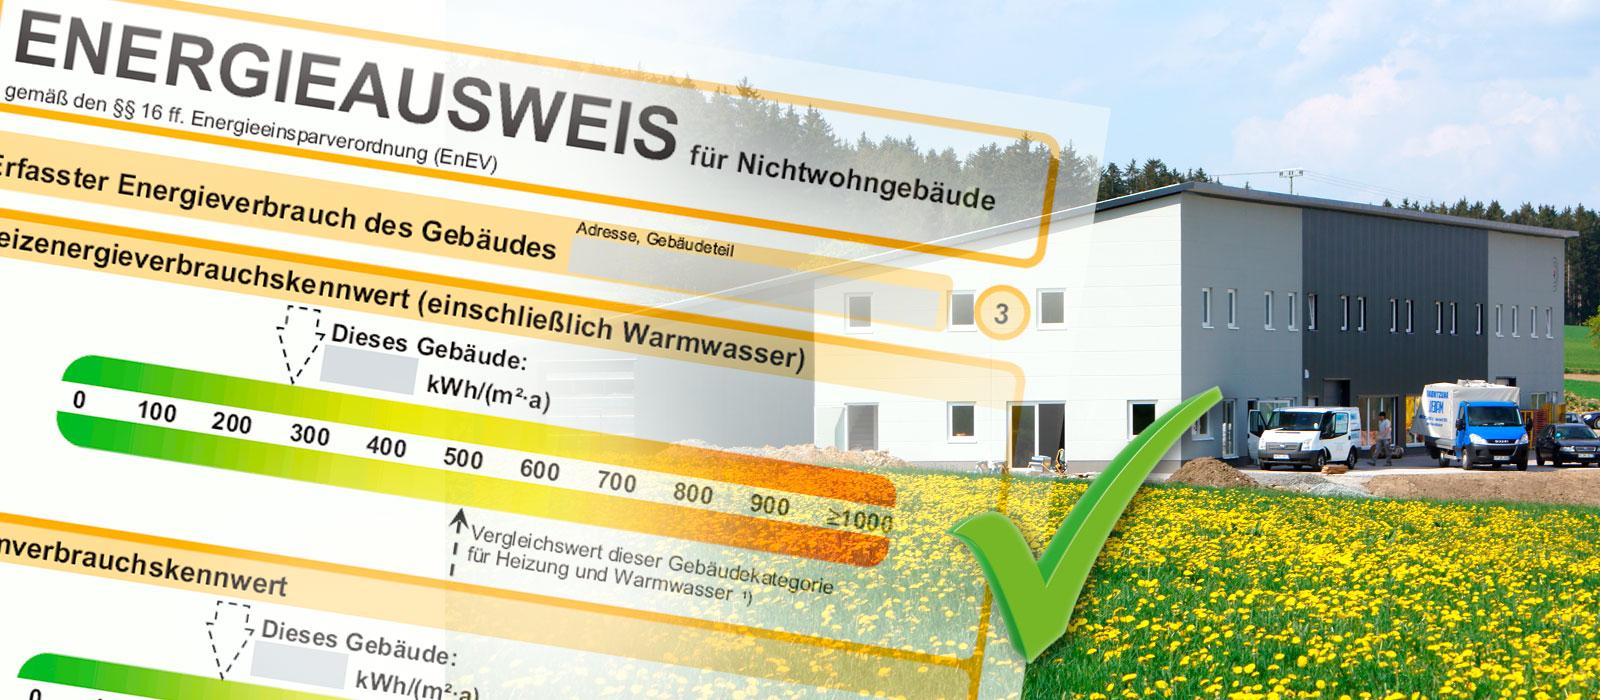 Energieberatung-Energieausweis-Nicht-Wohngebaeude